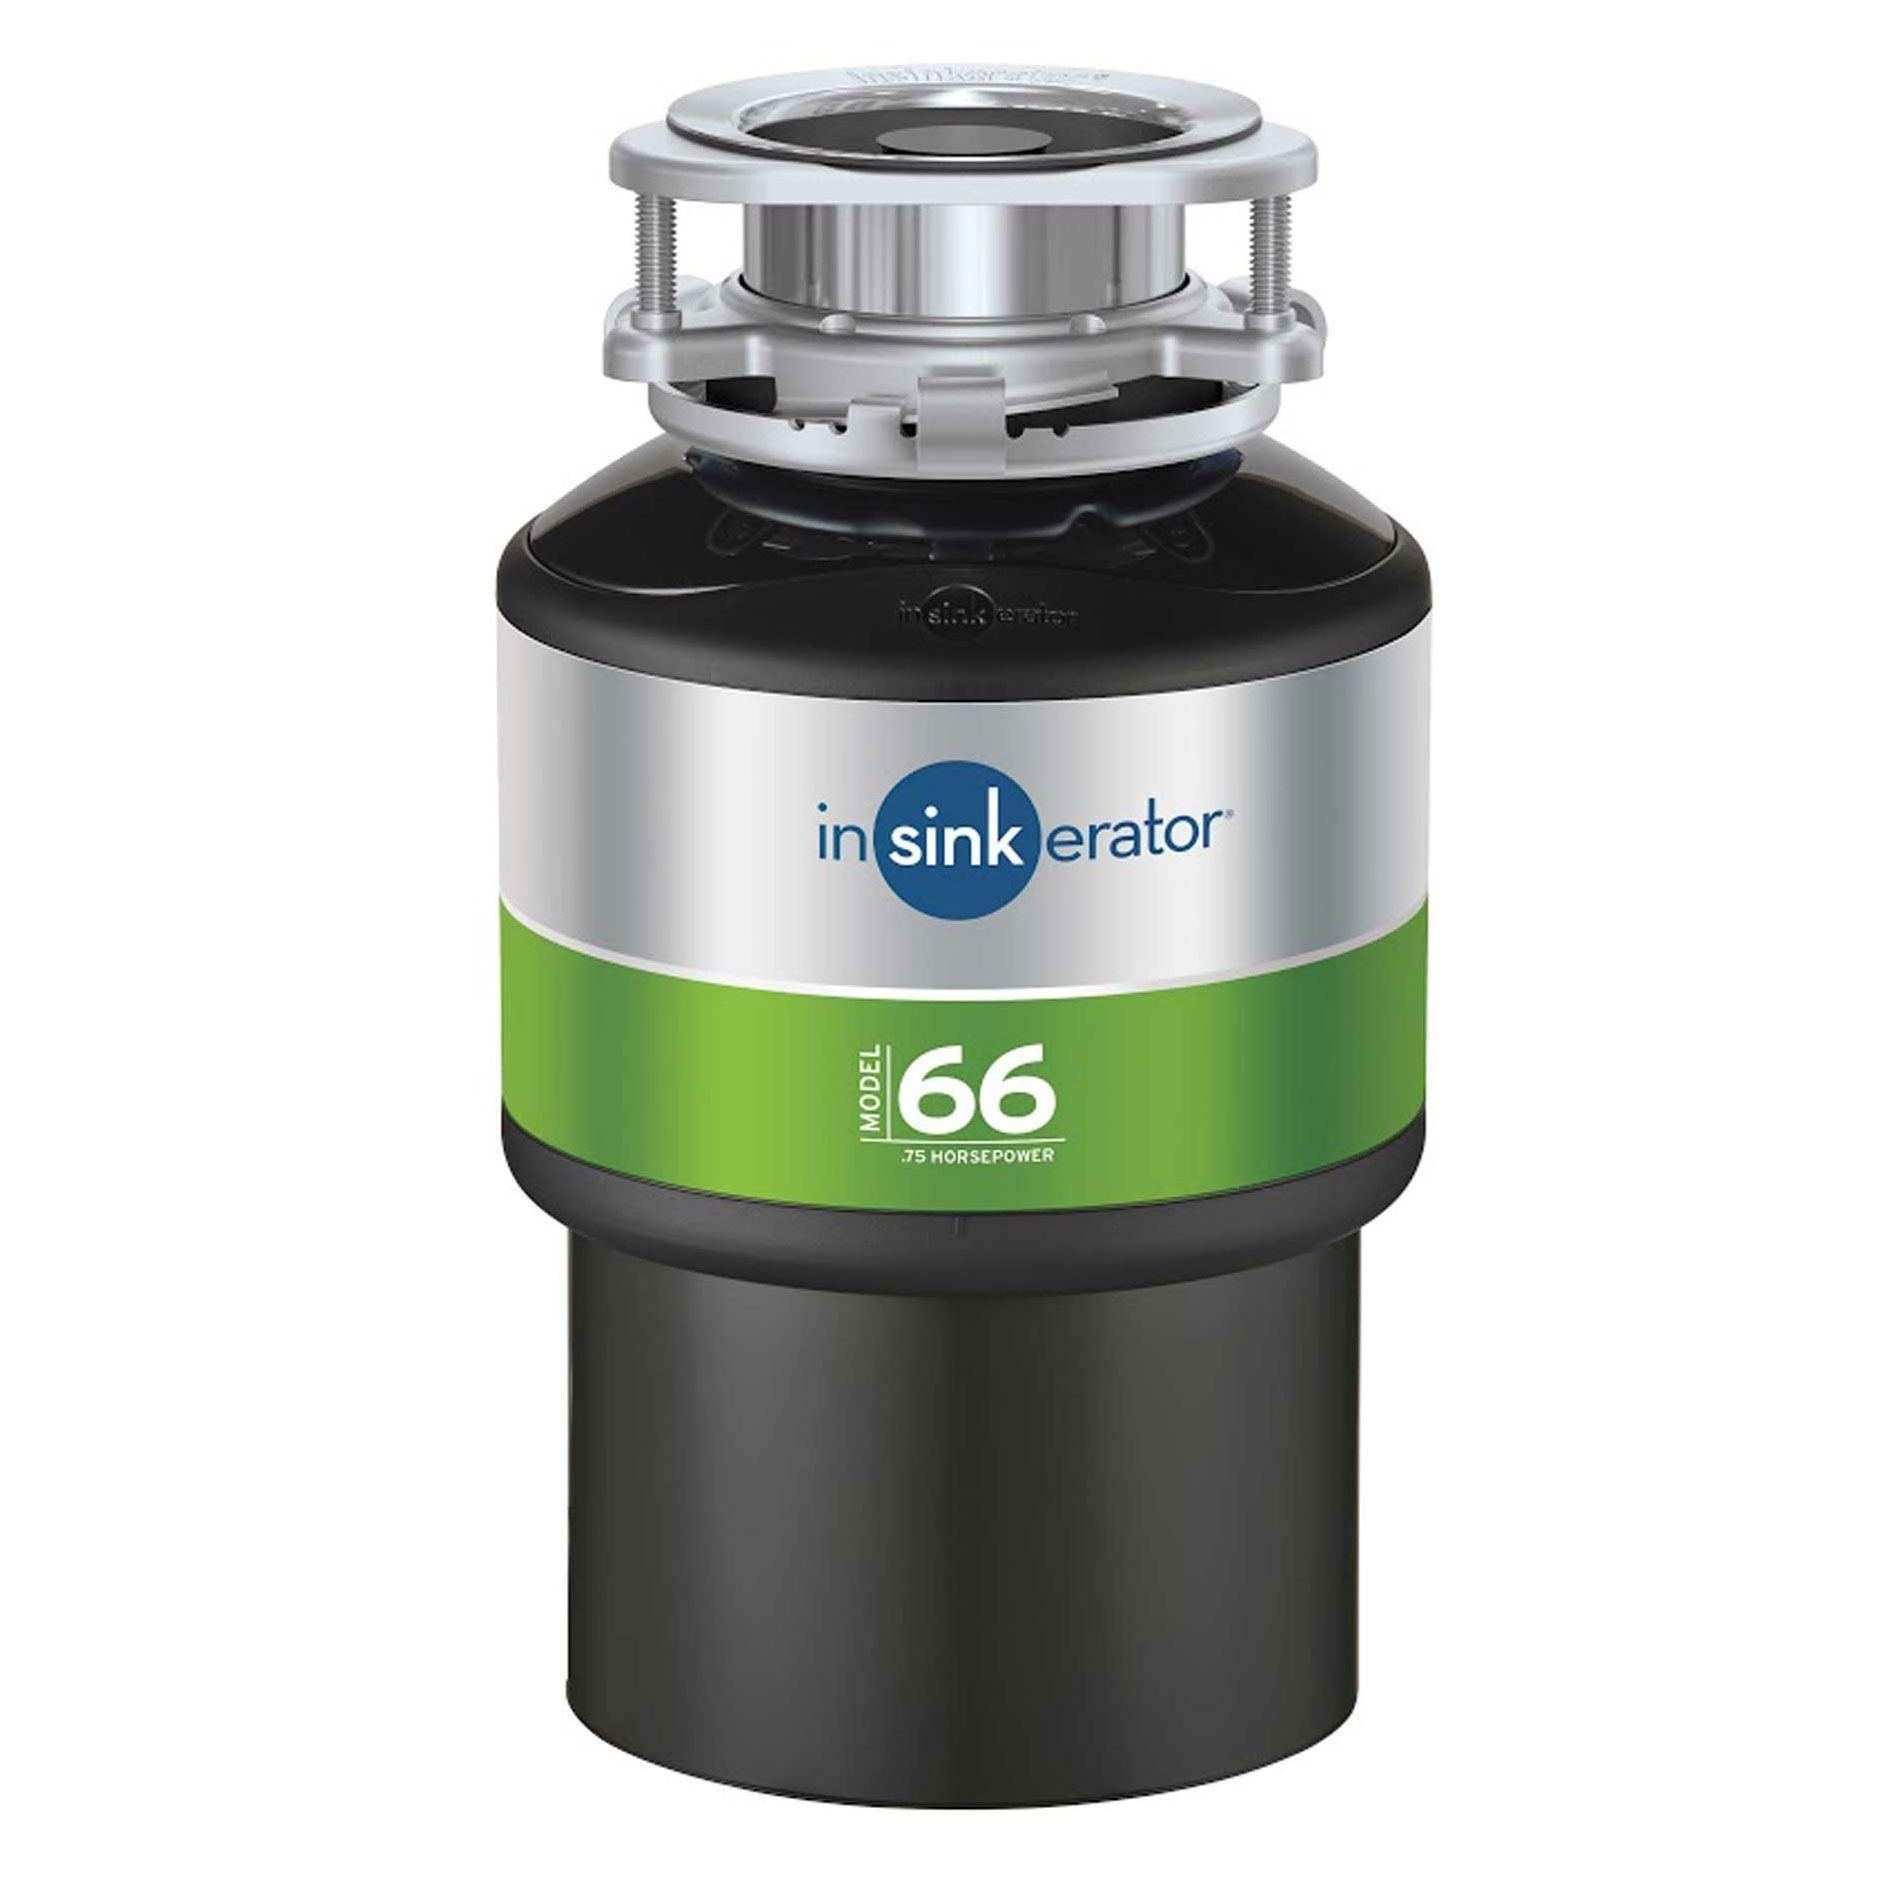 InSinkErator: Model 66 Waste Disposal - Kitchen Sinks & Taps